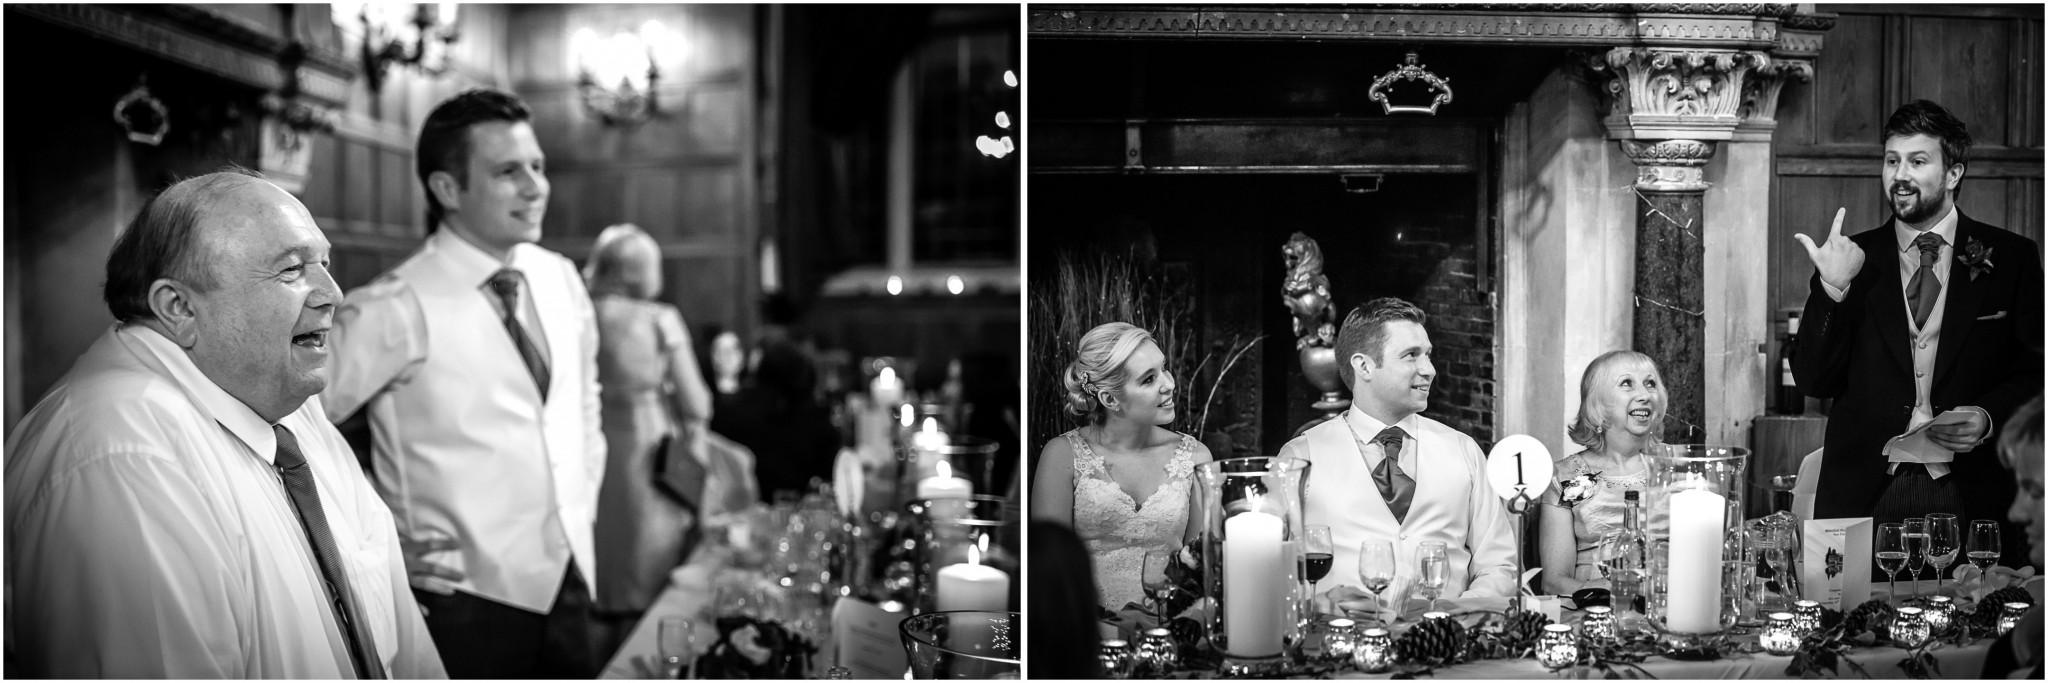 Rhinefield House Wedding Best Man's speech